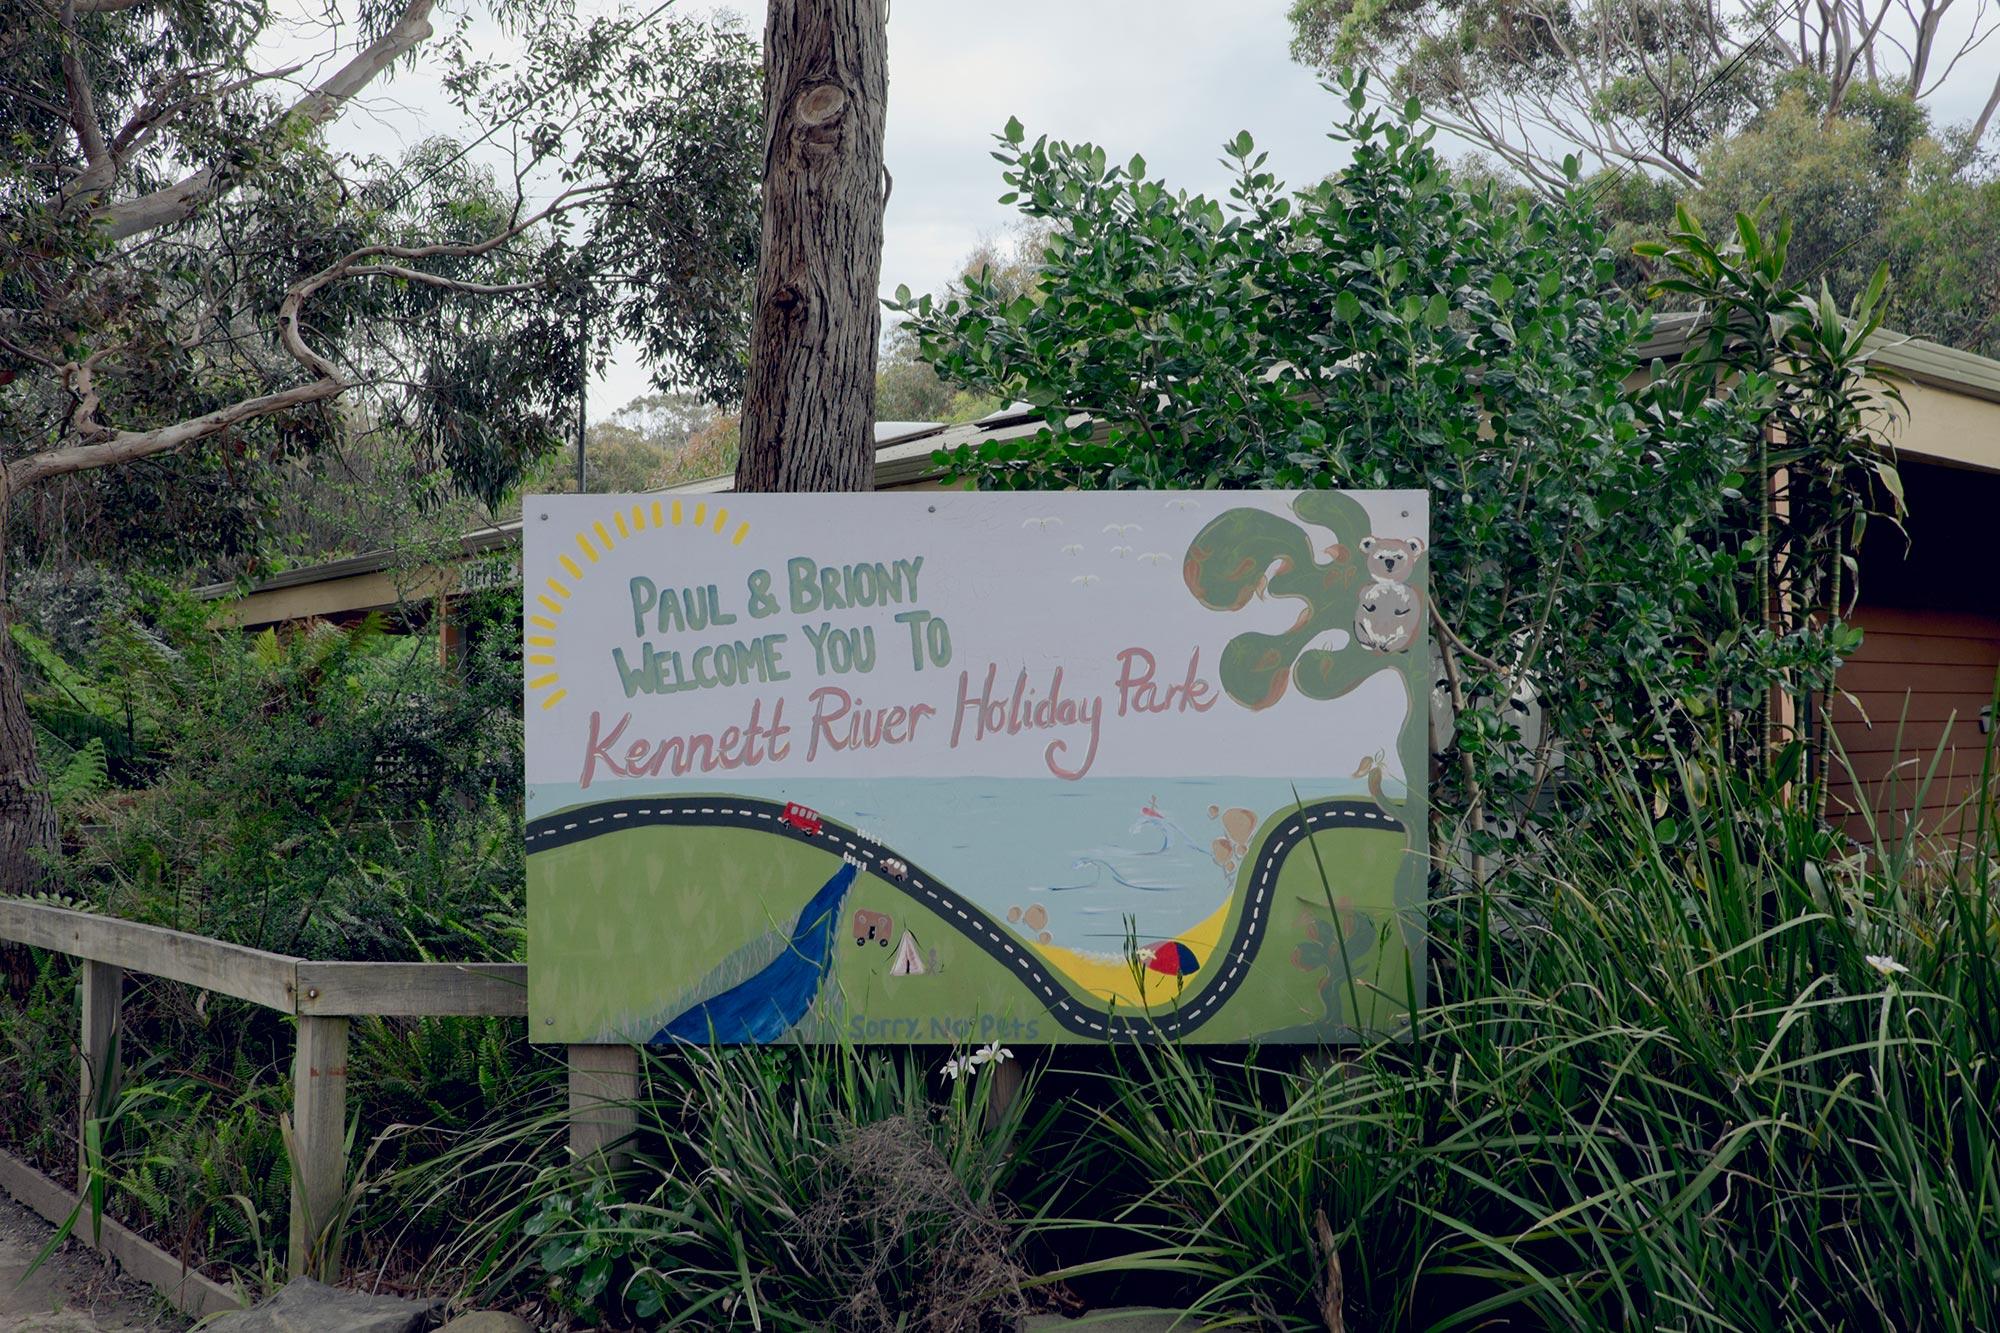 australia-melbourne-great-ocean-road-kennet-river-holiday-park-koala9